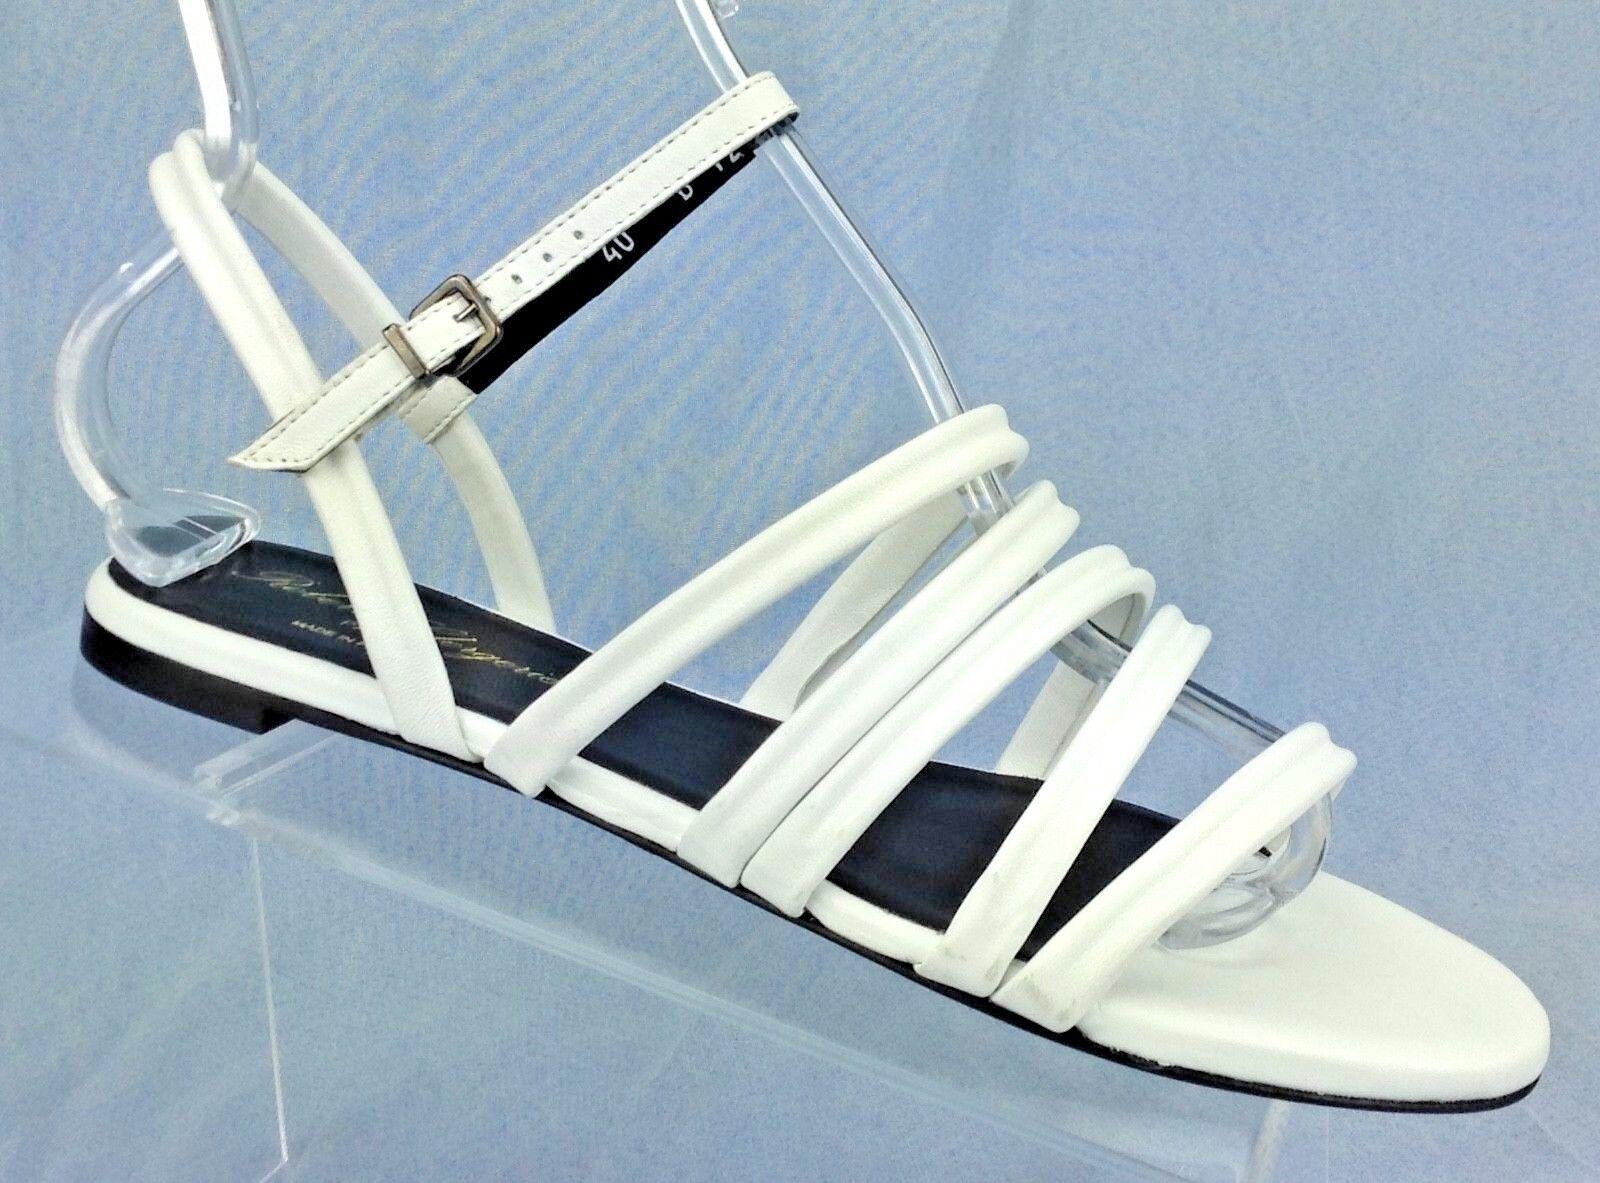 Robert Robert Robert Clergerie Gaga 40 bianca Nappa Leather Flat Sandals scarpe Donna  US 9.5 5c8d4b